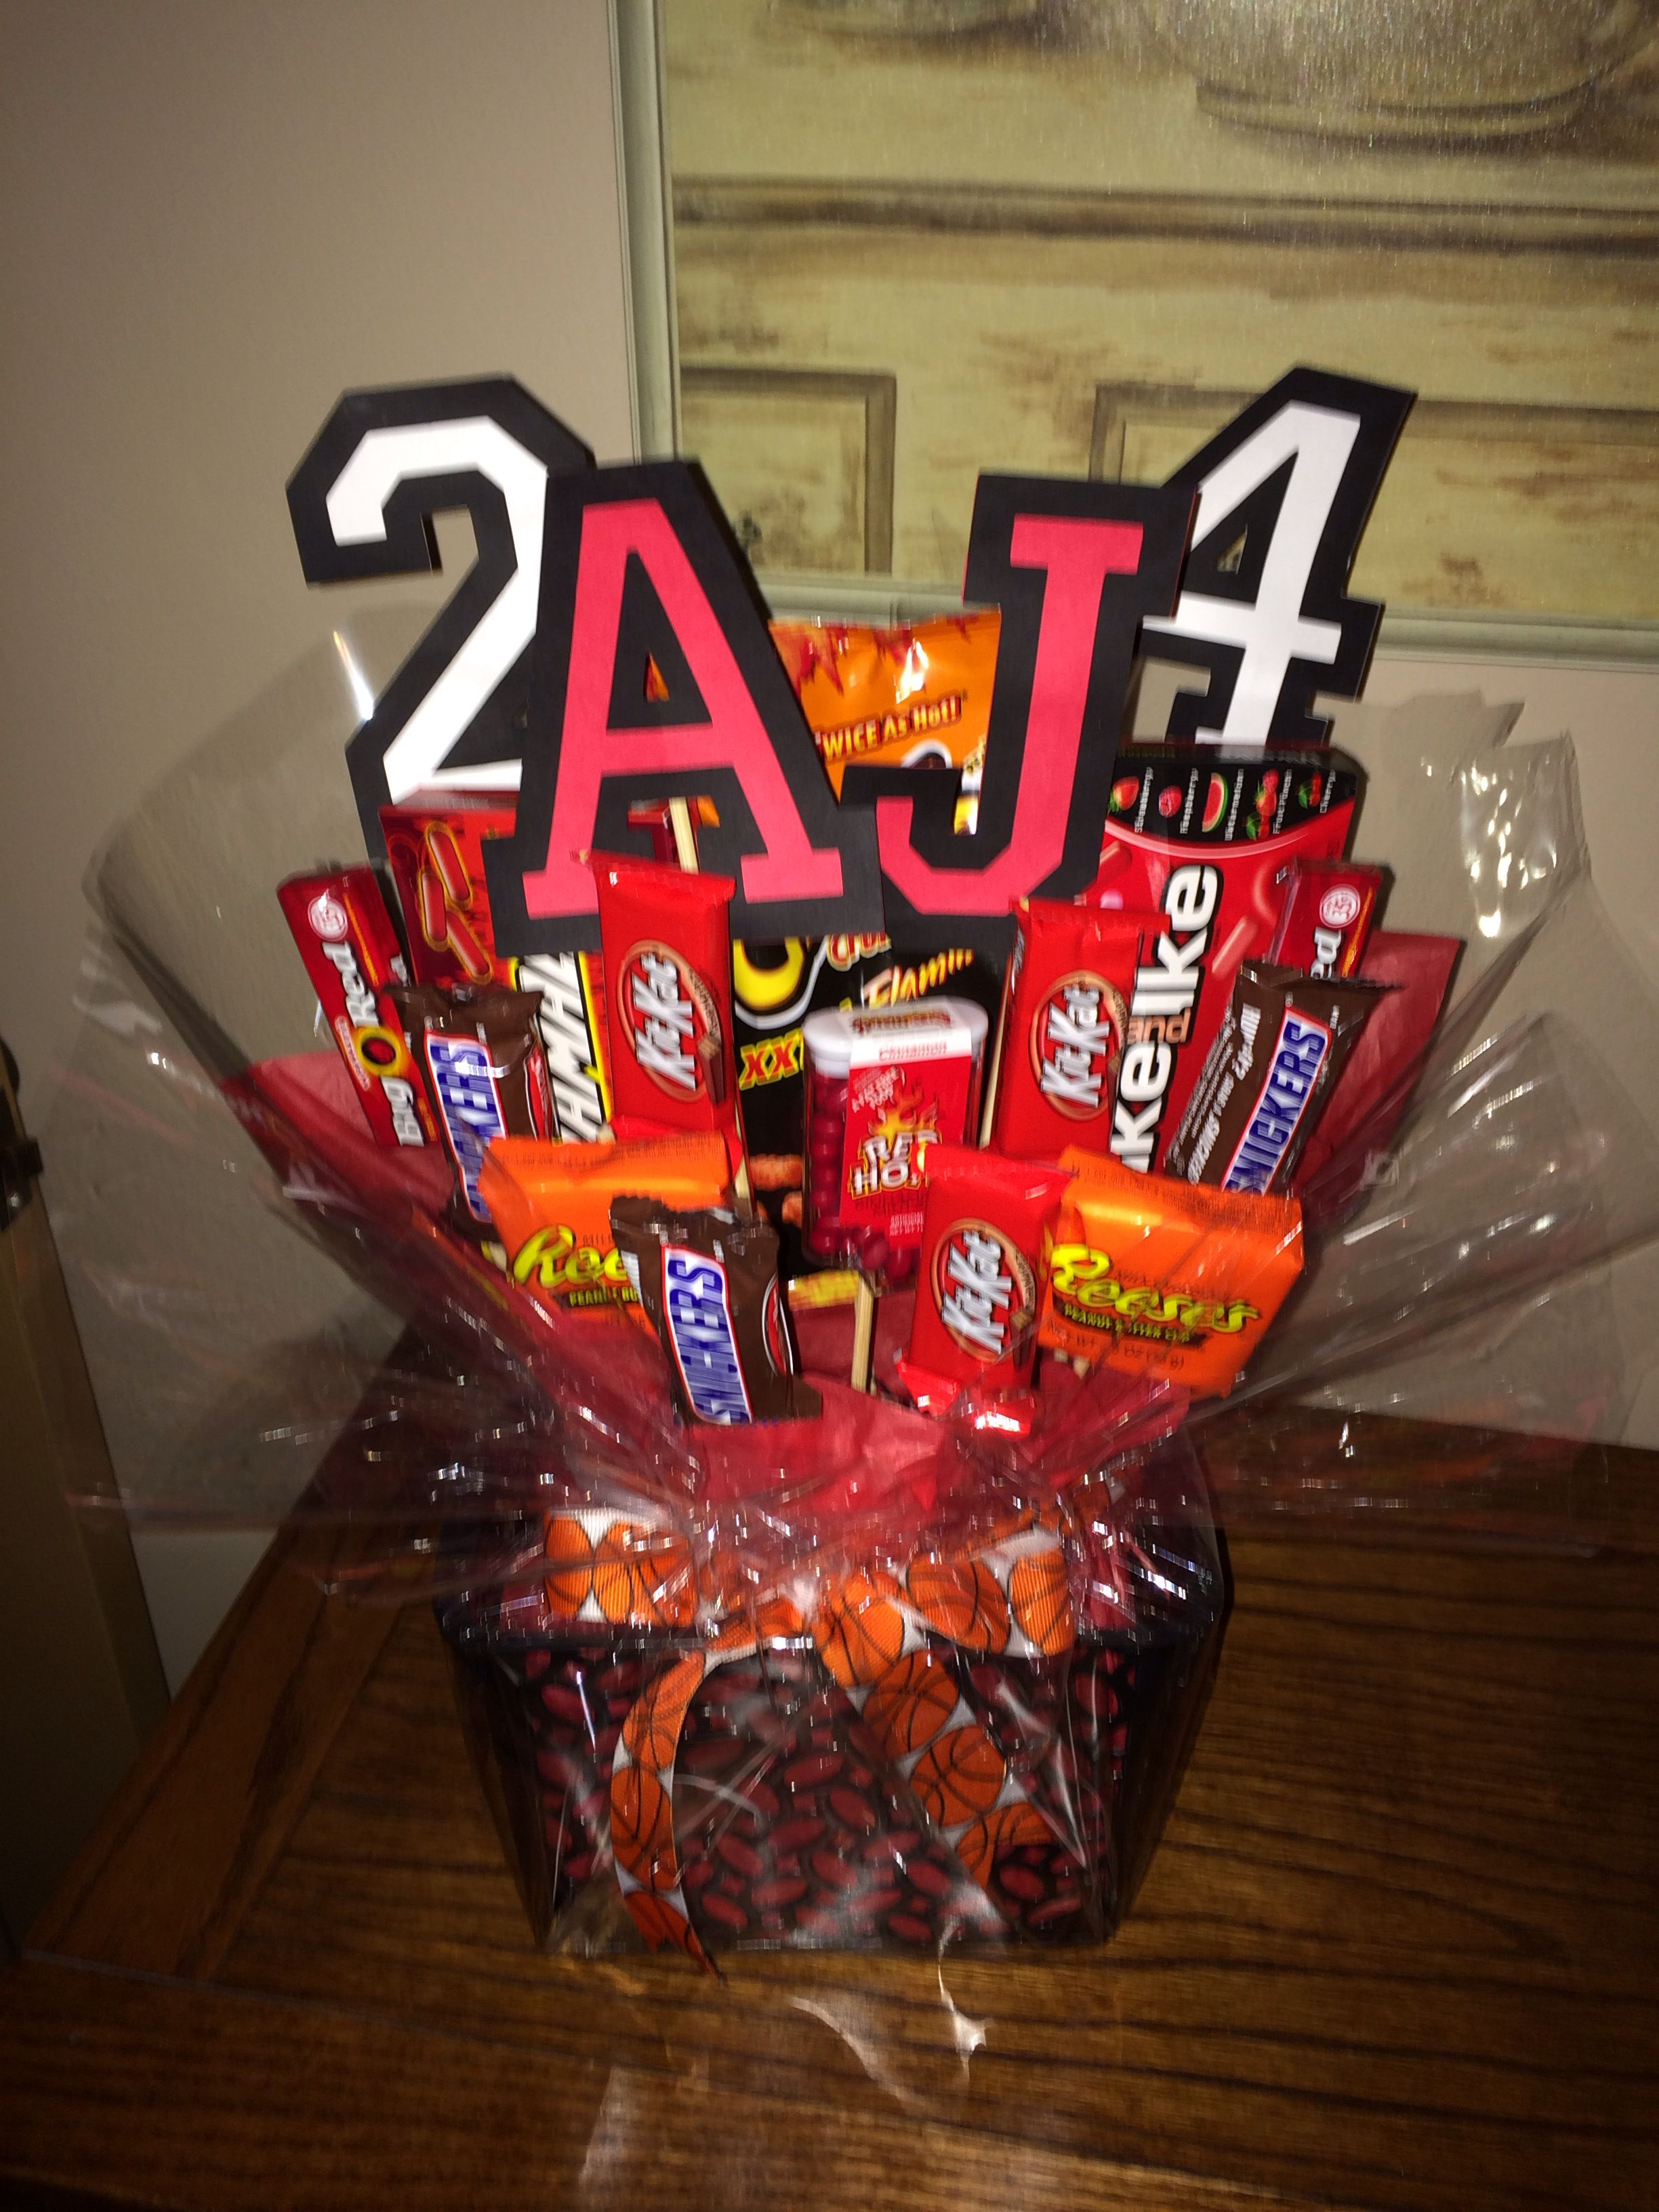 Basketball player treat basketball player gifts senior